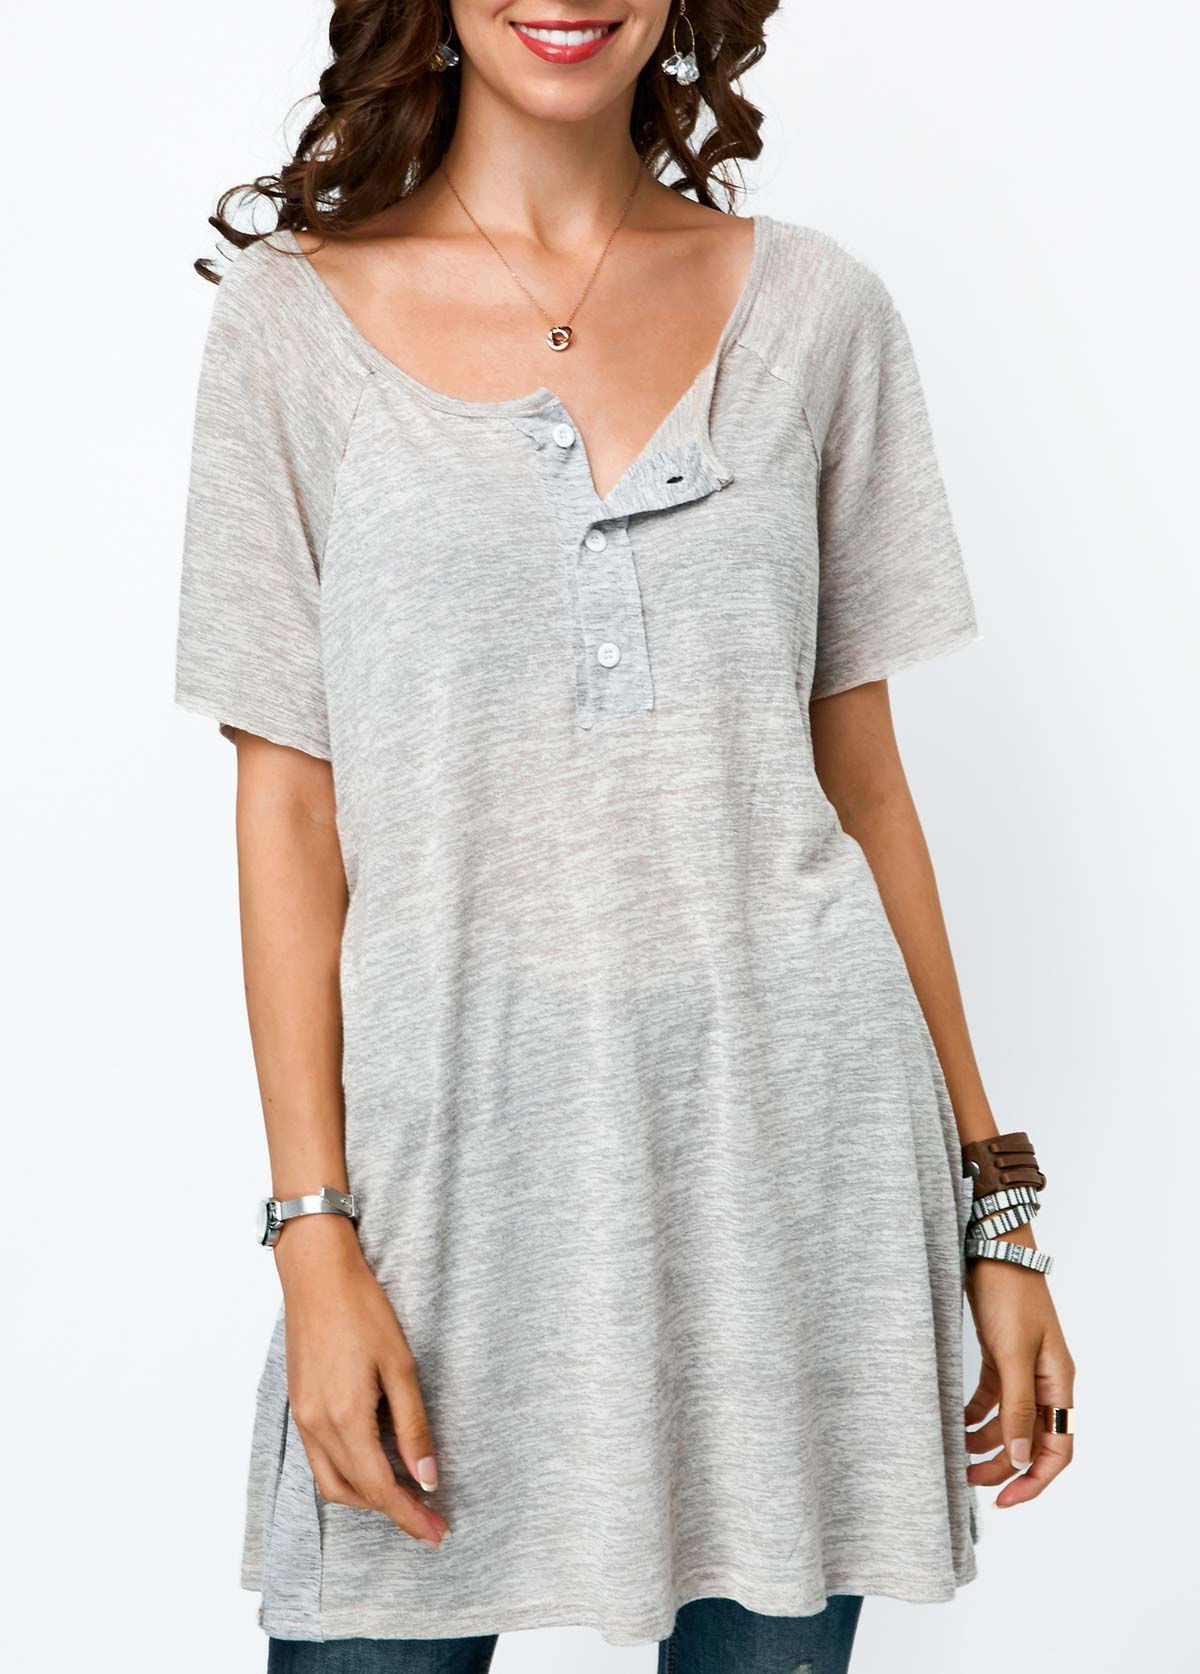 Button Detail Short Sleeve Grey Tunic T Shirt